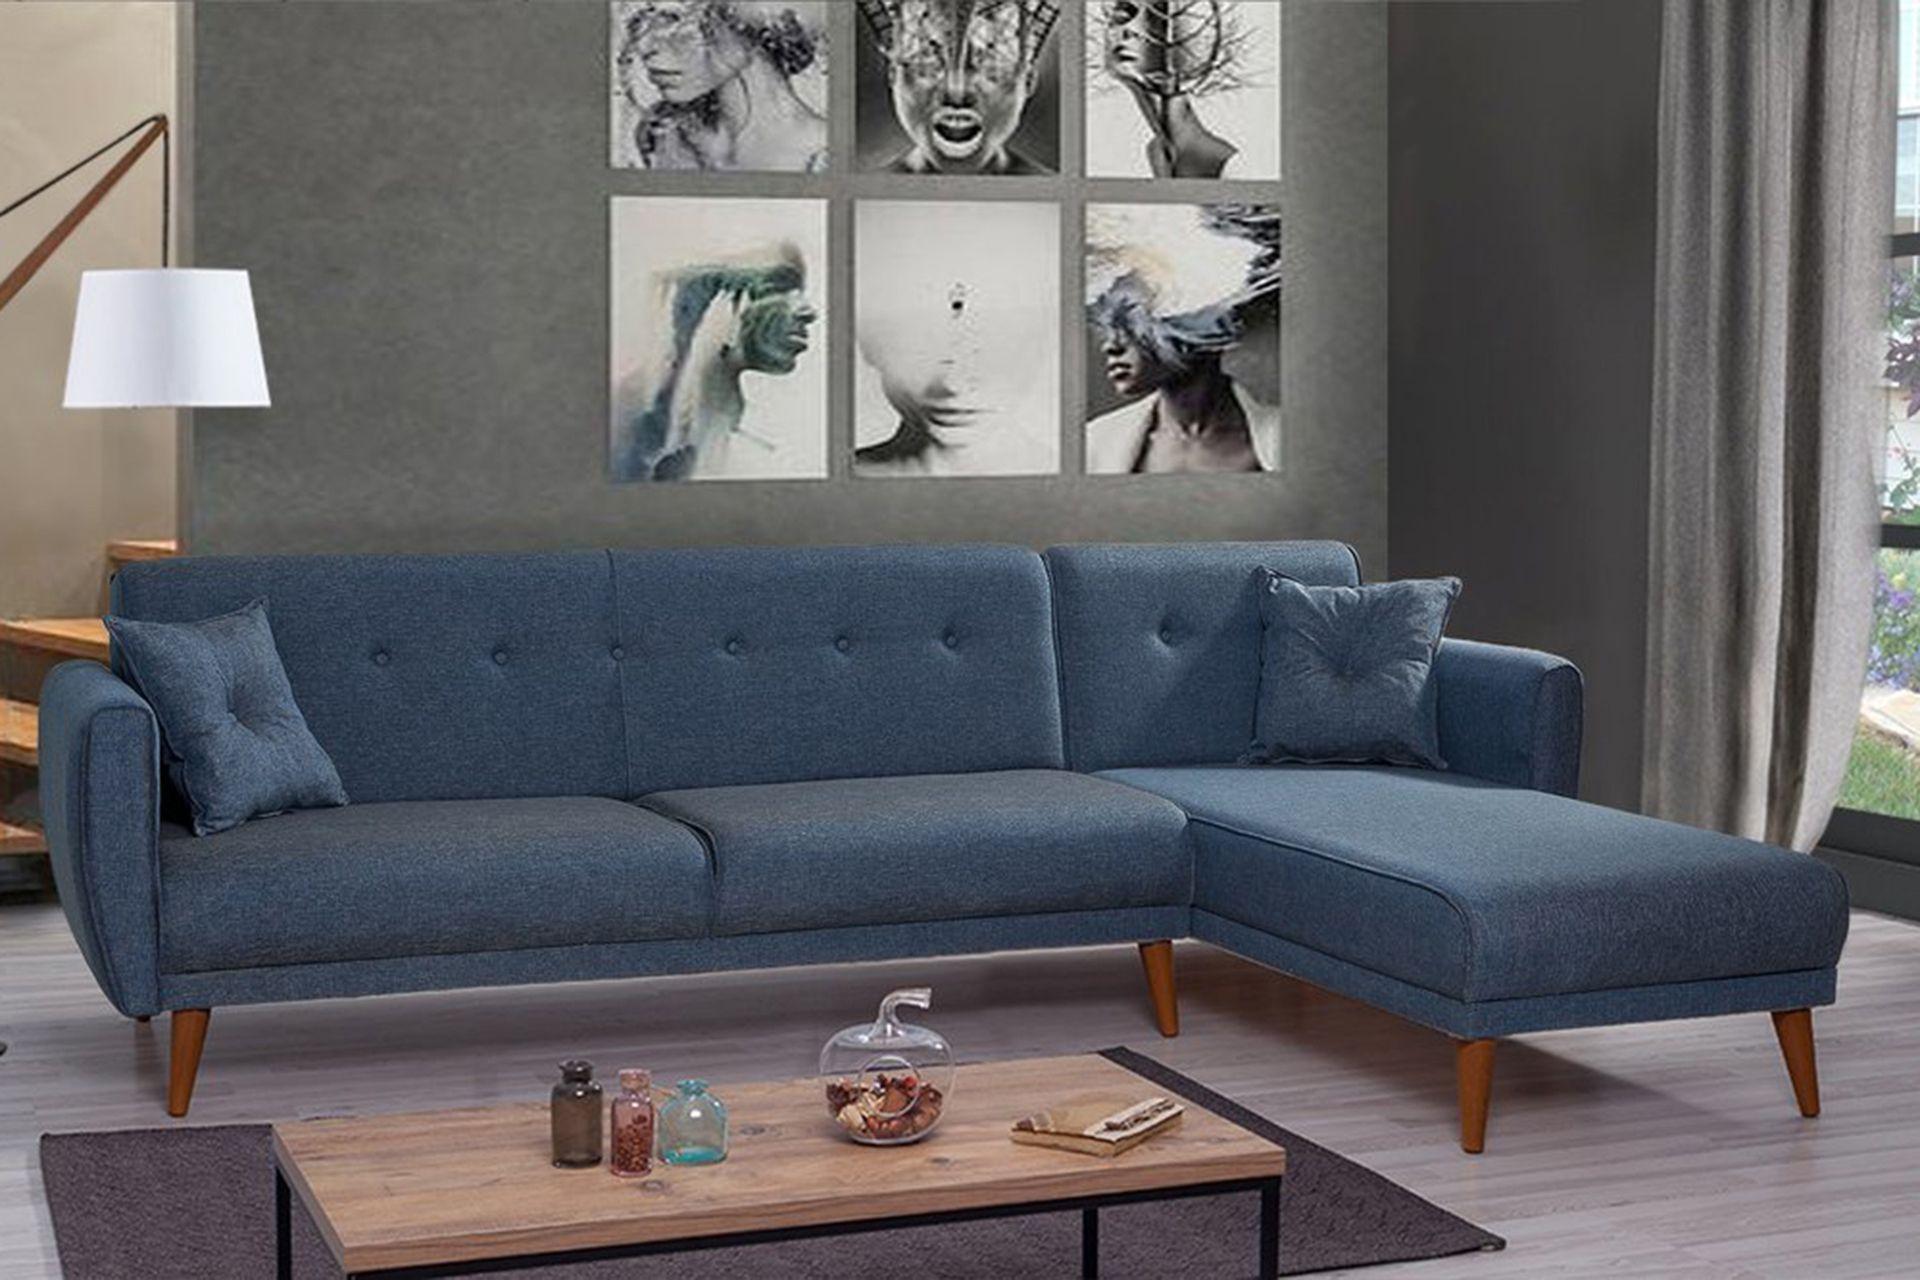 Aria corner Sofa Bed, Navy Blue (Right)